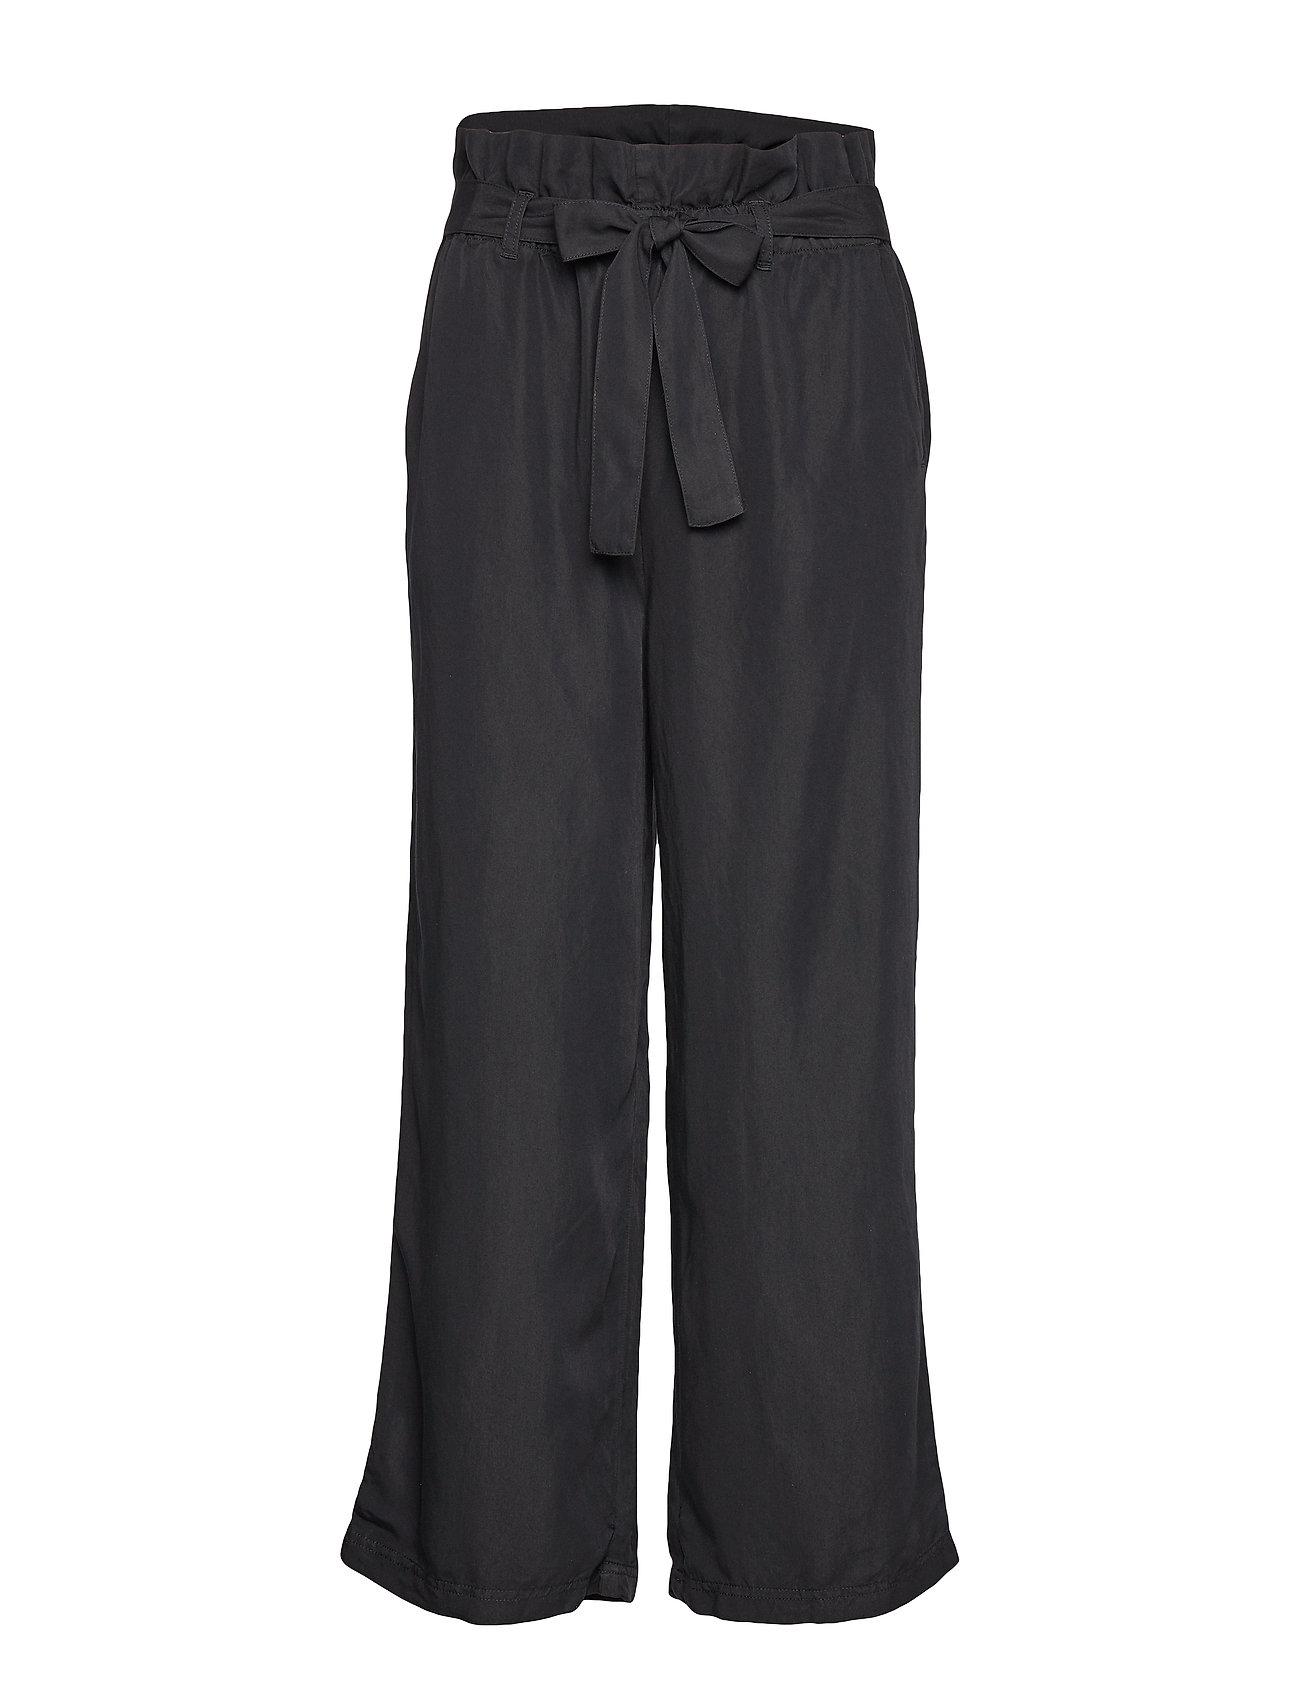 Cream Gaya Culotte Pants - PITCH BLACK